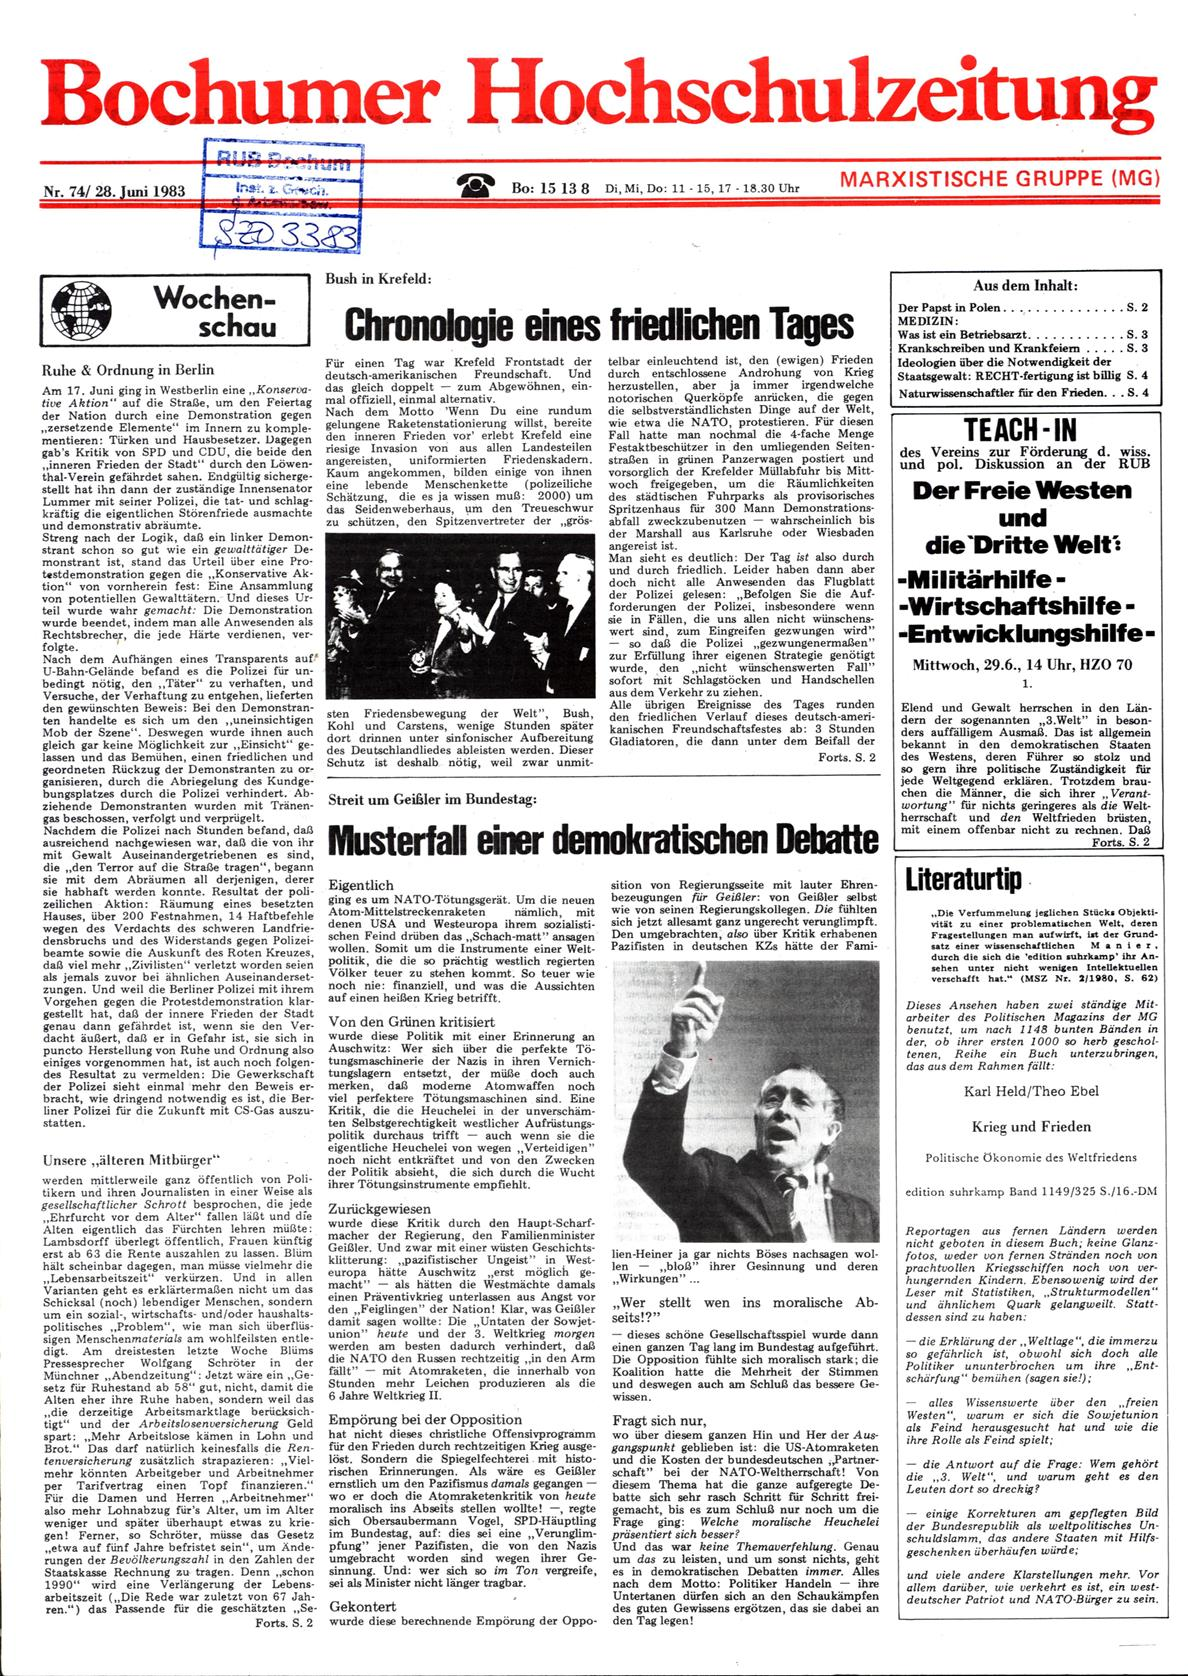 Bochum_BHZ_19830628_074_001